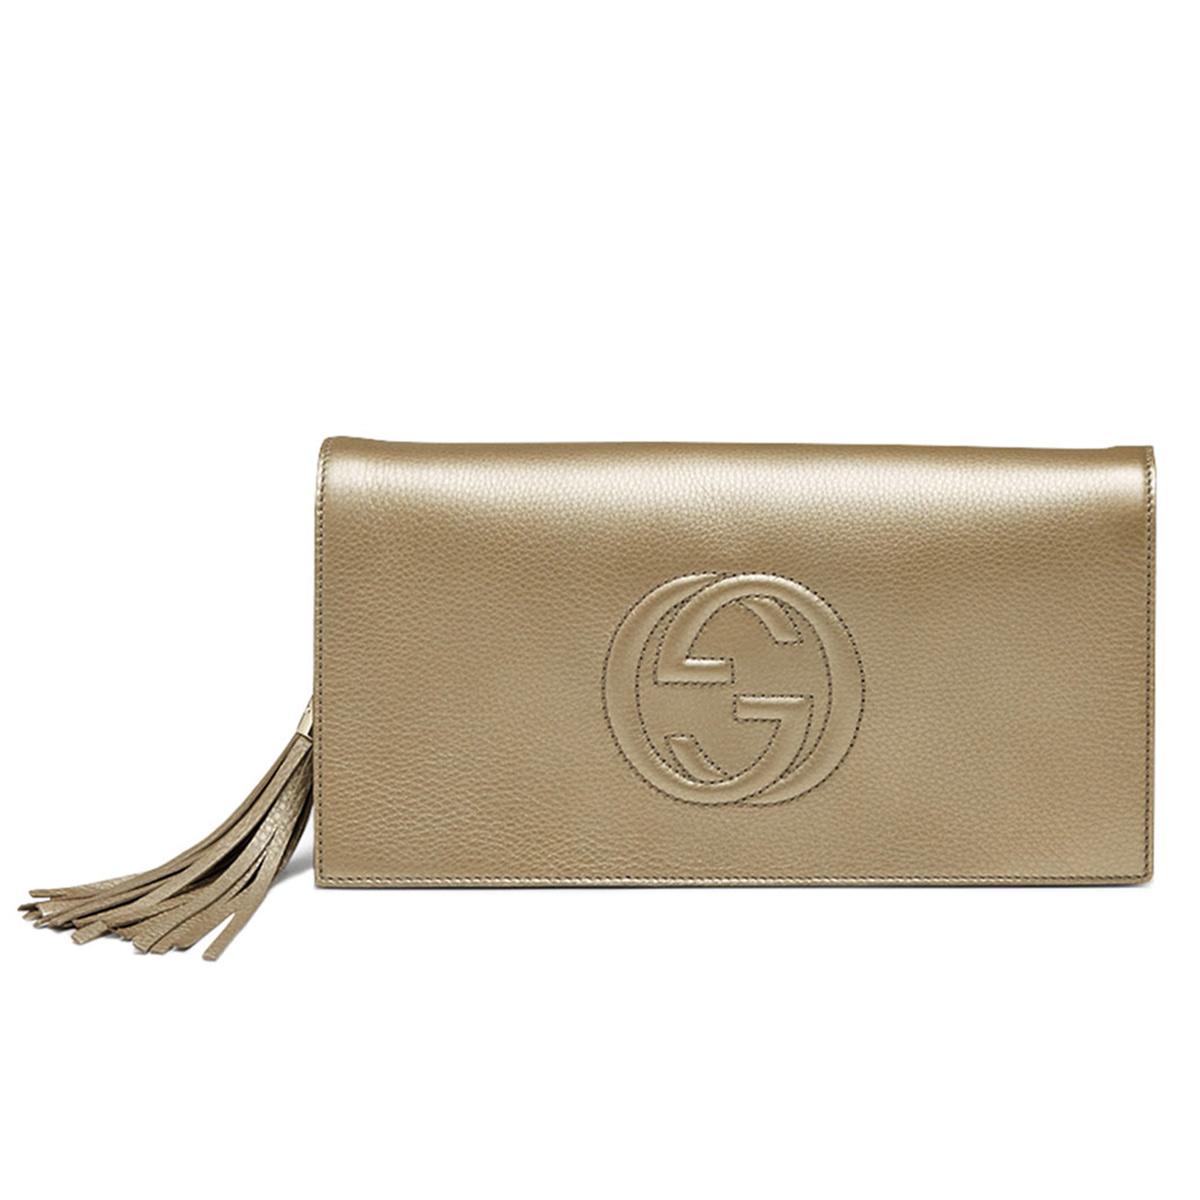 bc-gucci-soho-metallic-leather-clutch-gold